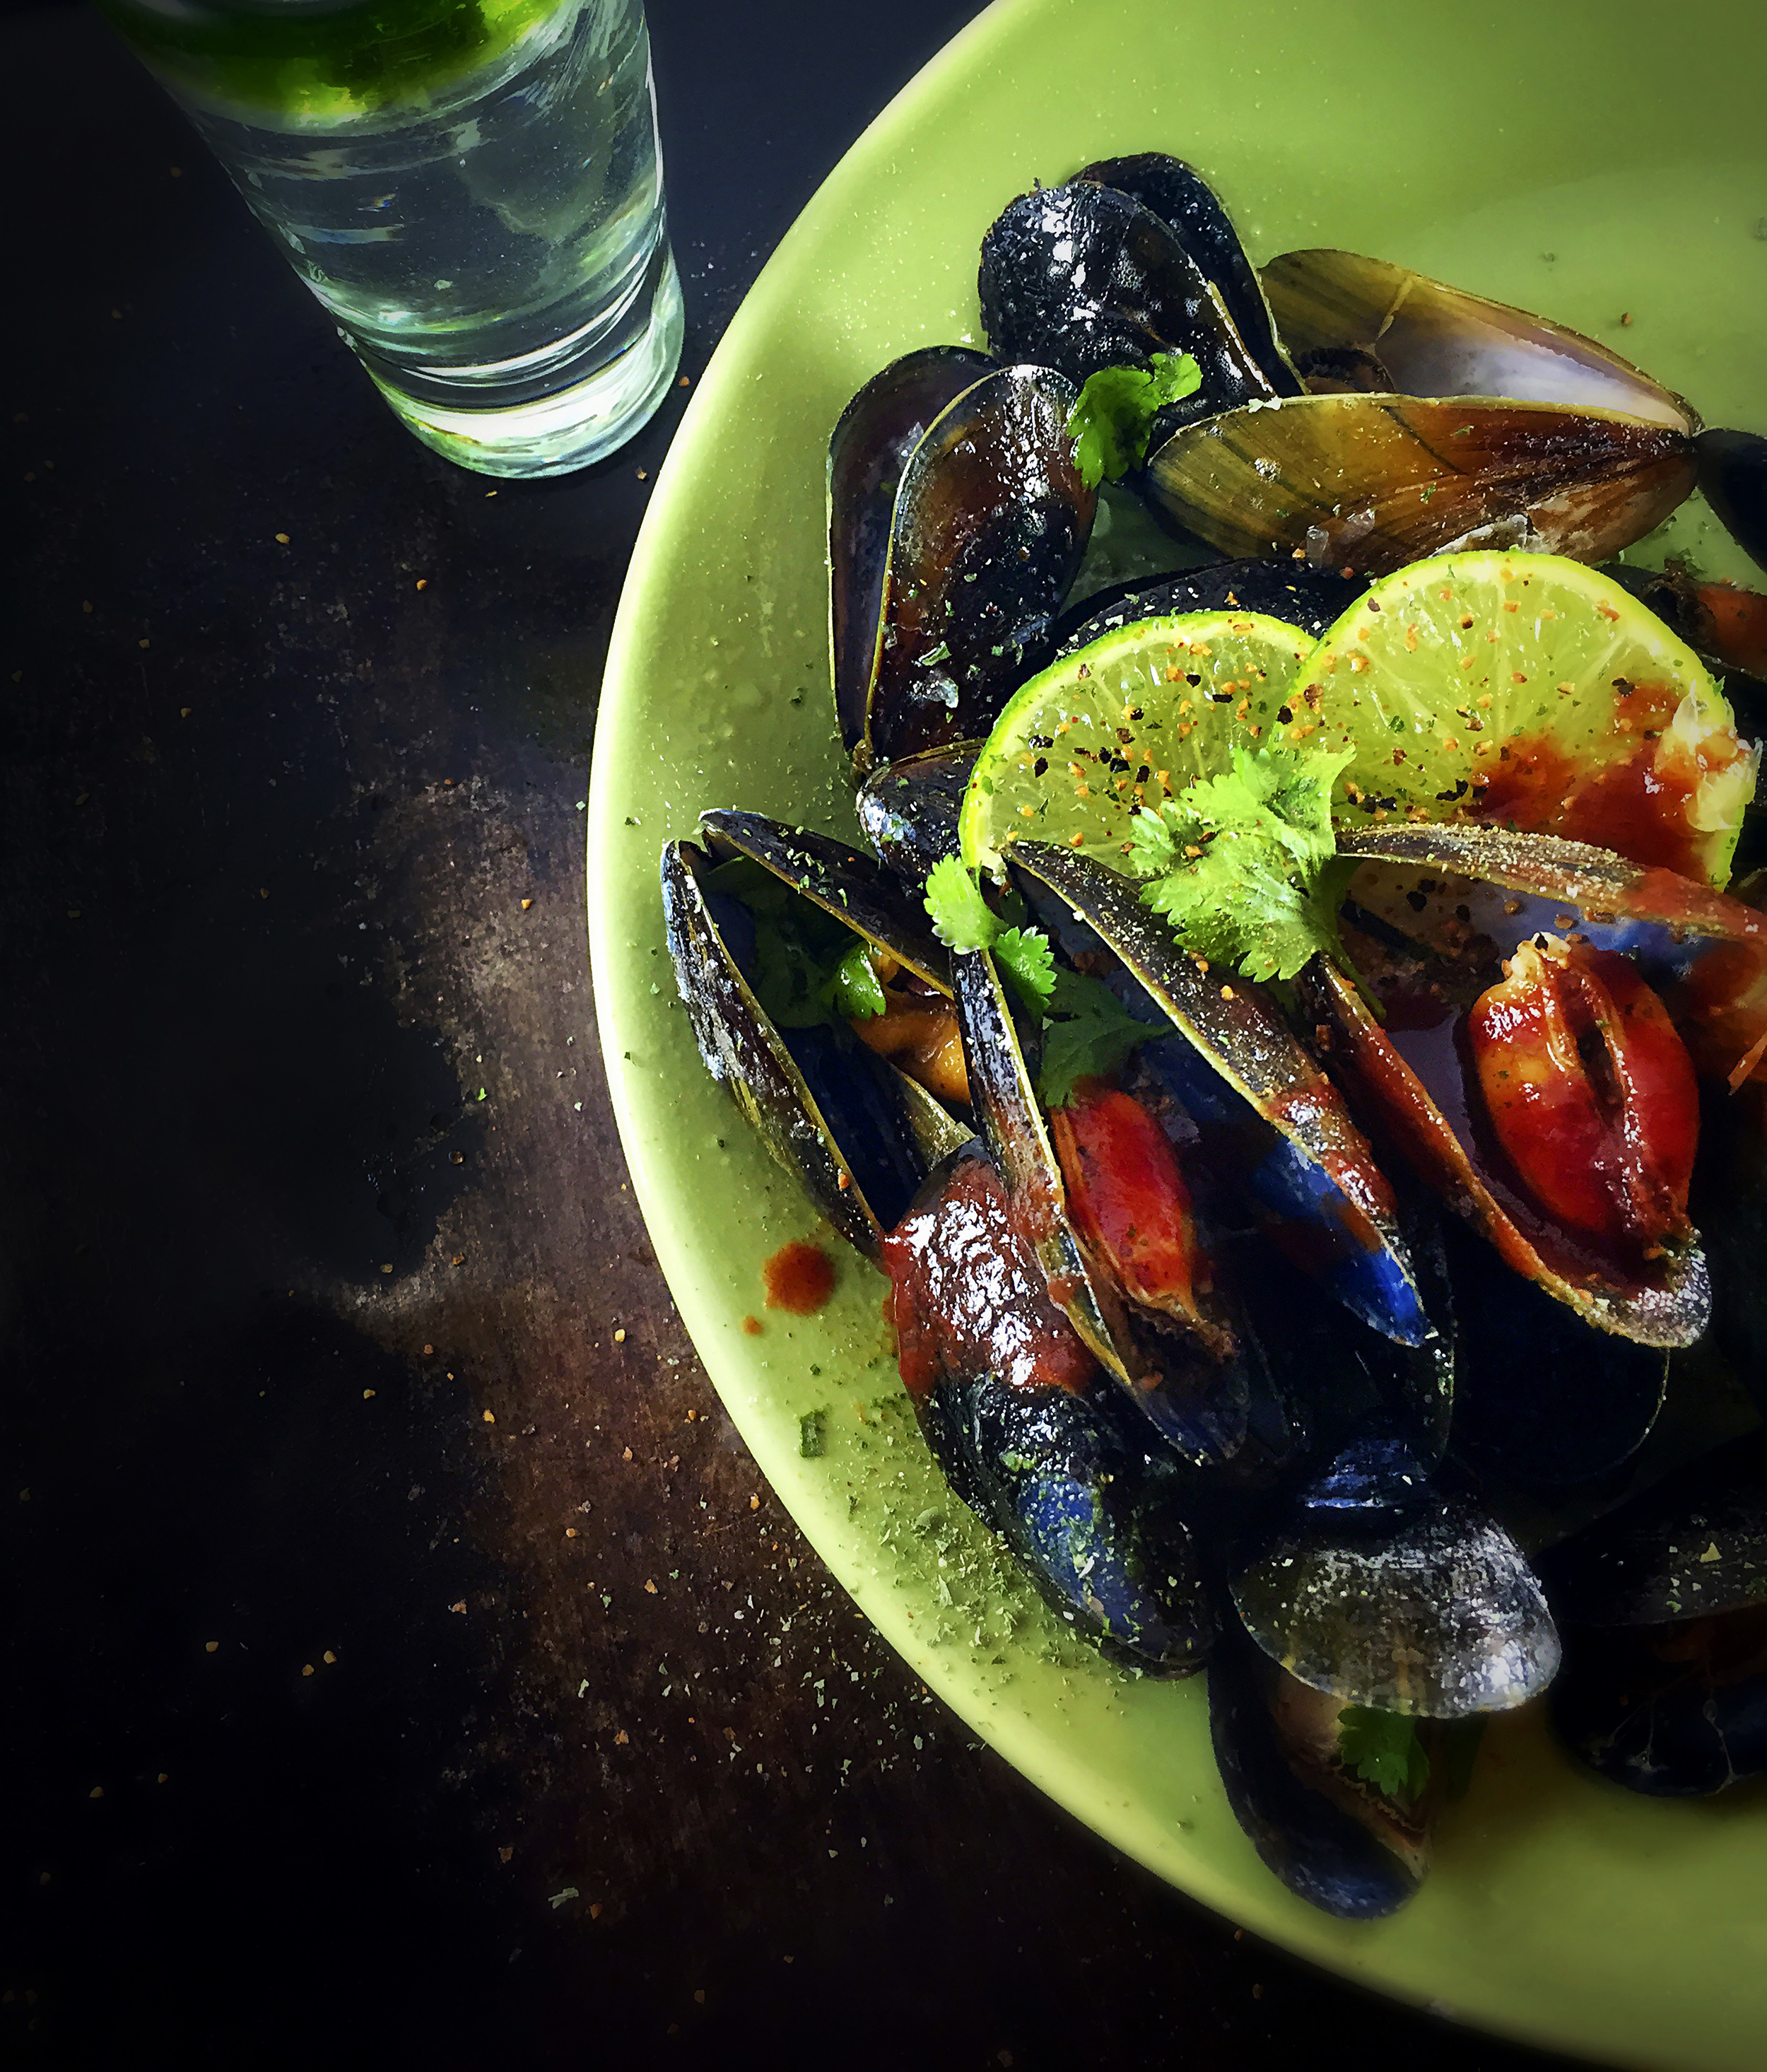 Spicy Garlic & Cilantro Mussels